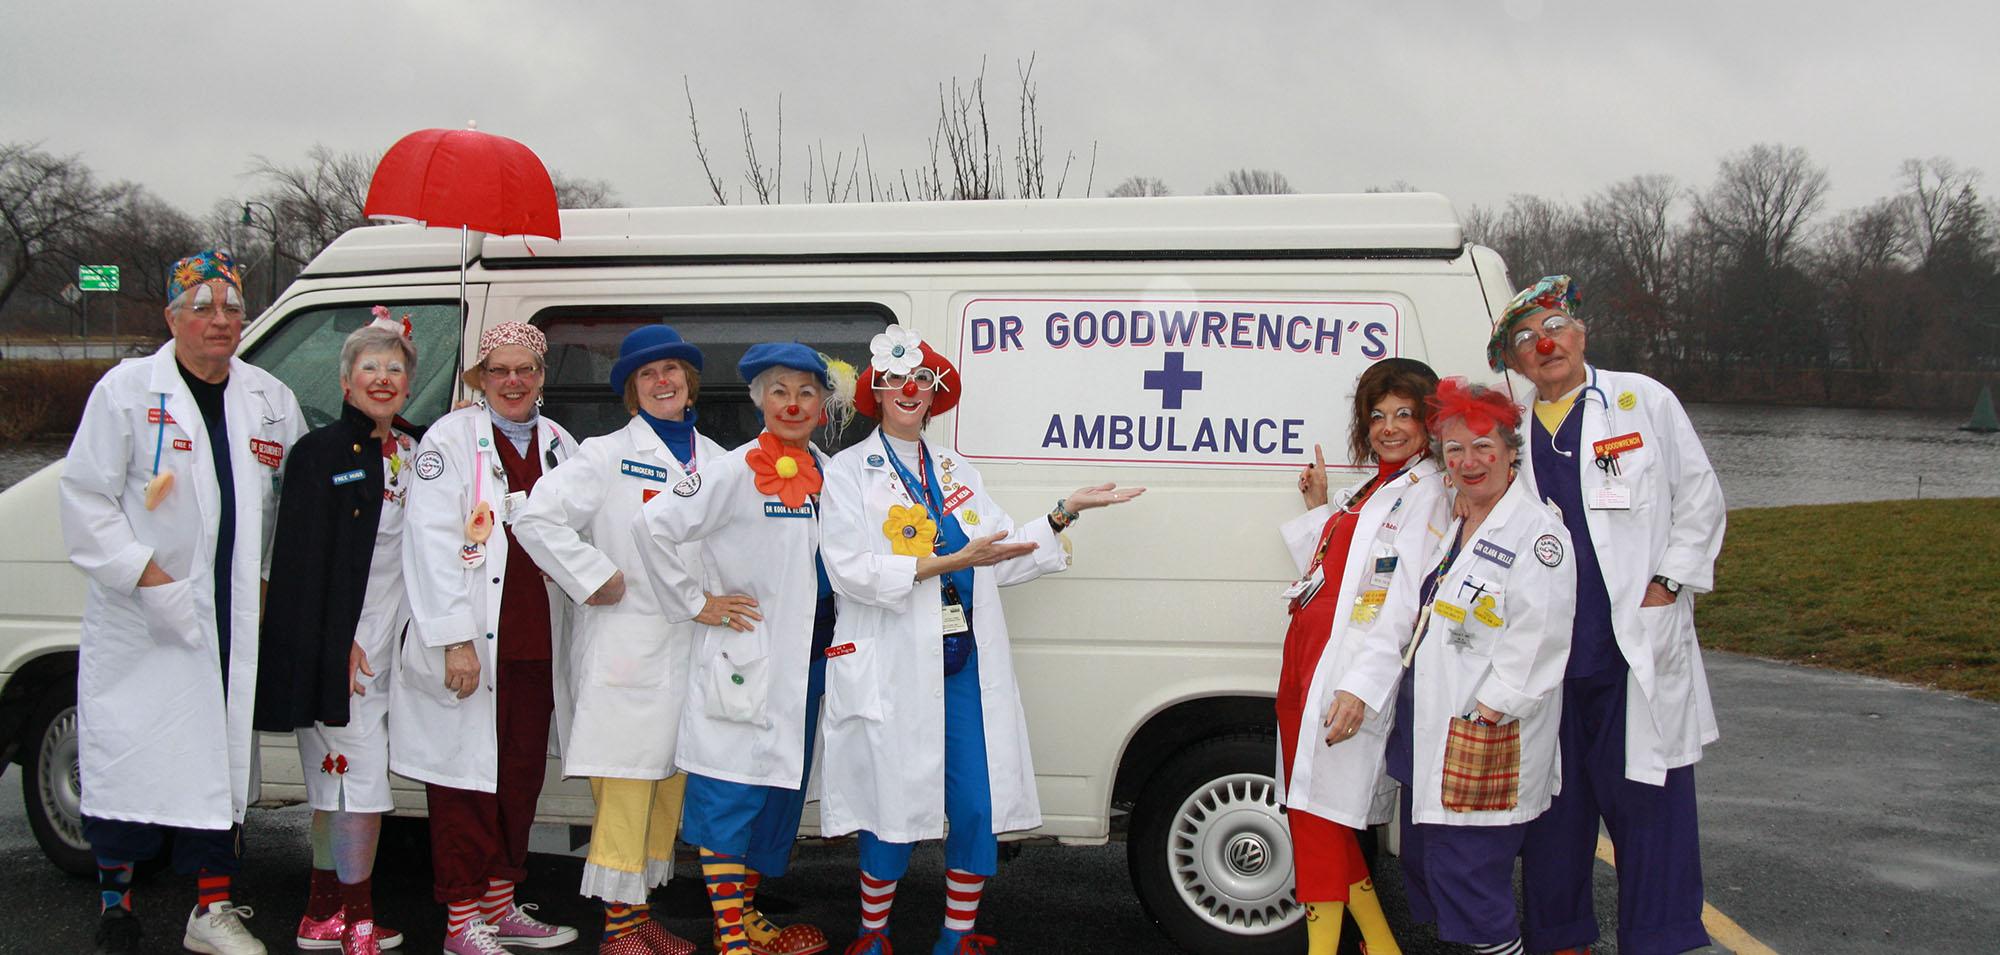 Clowns with clown ambulance.